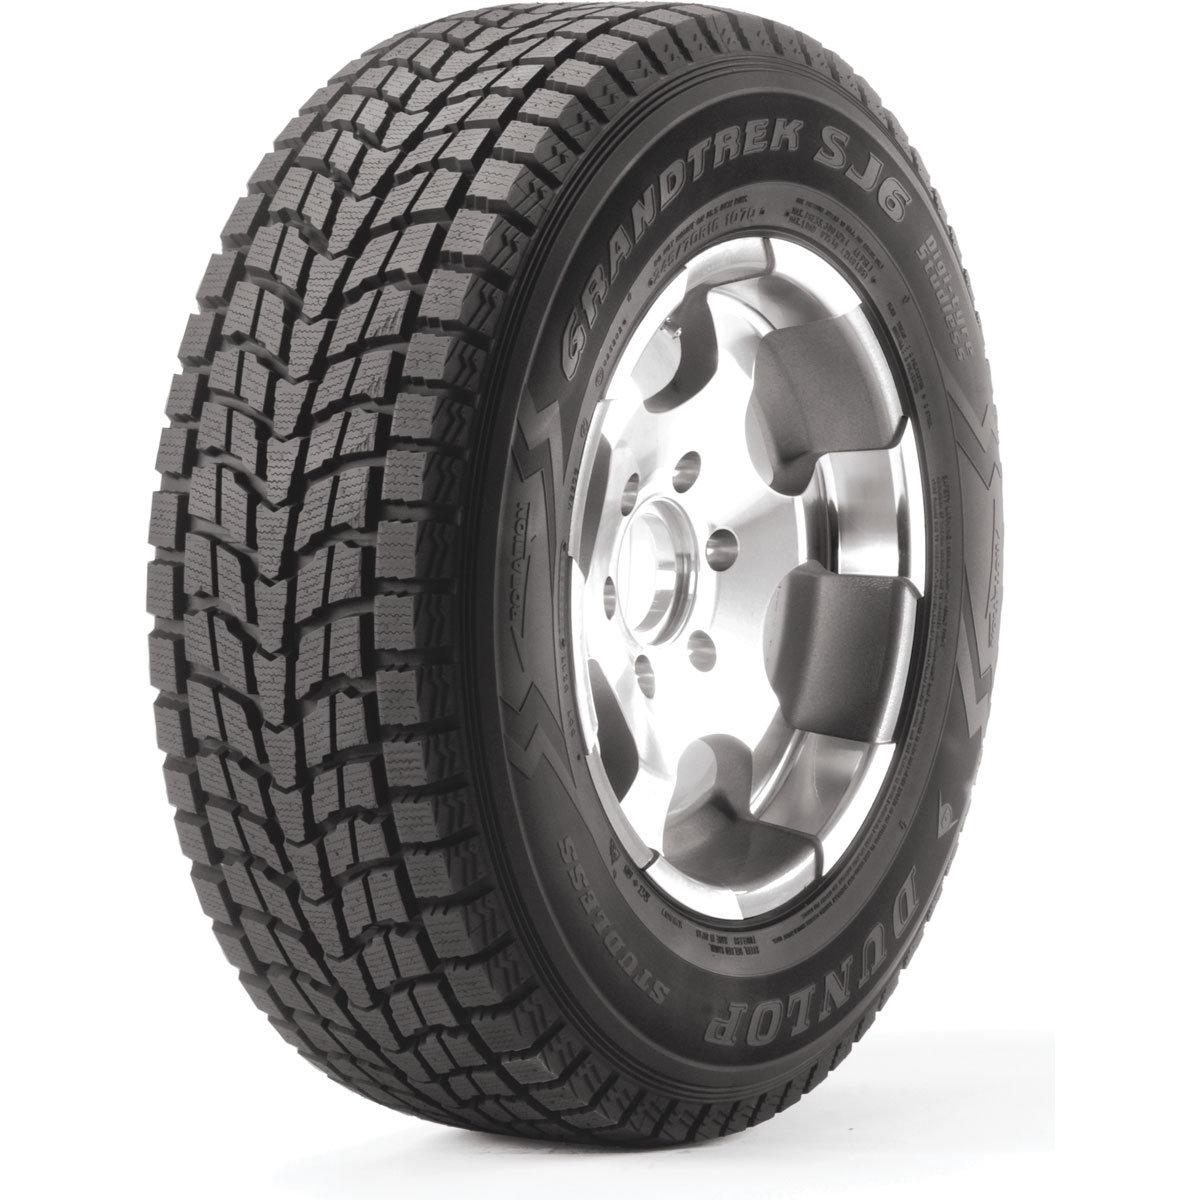 Neumático DUNLOP Grandtrek SJ 6 235/55R18 99 Q